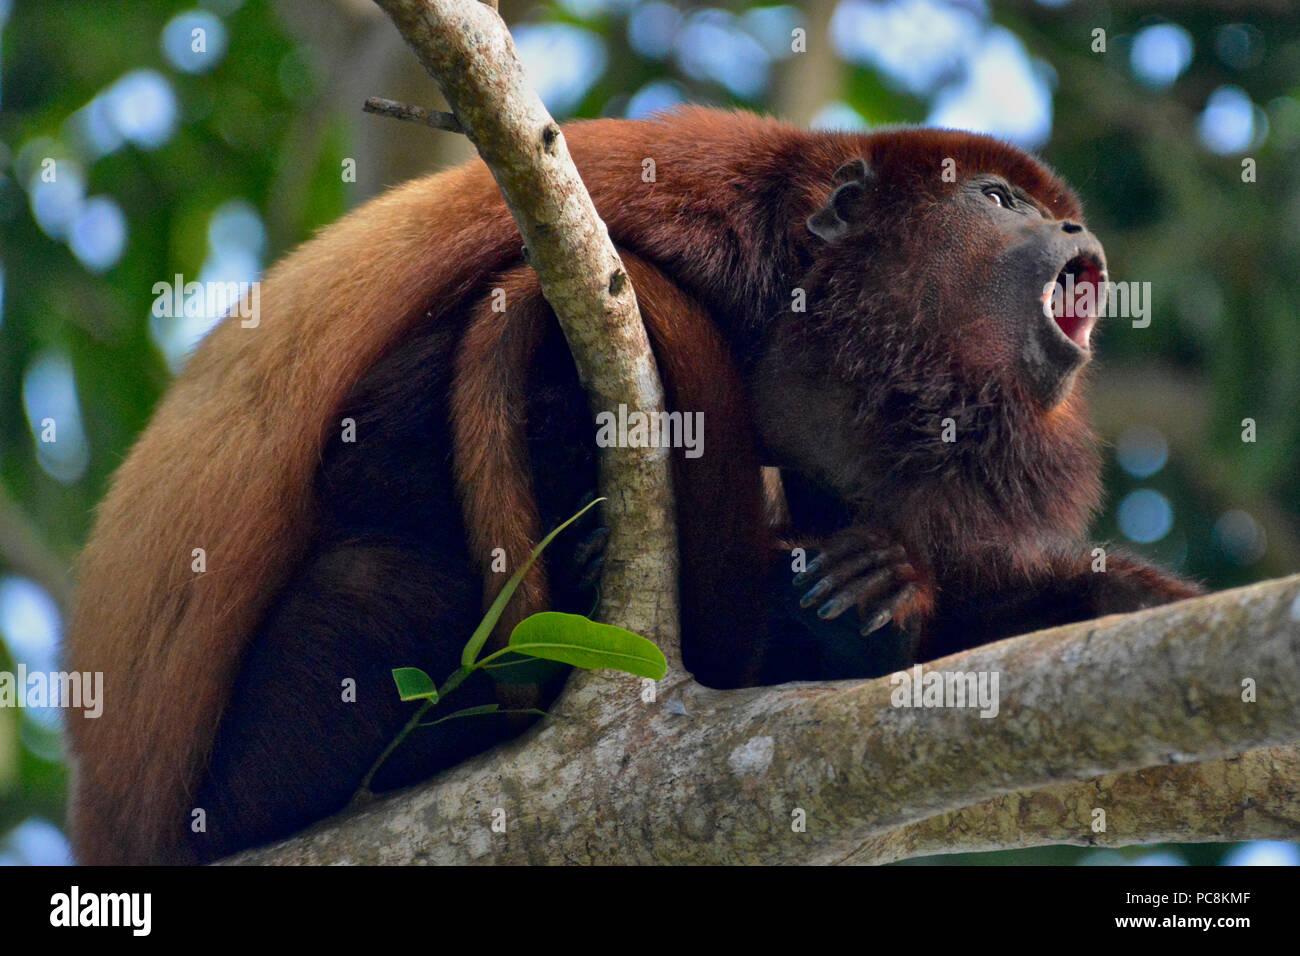 Un mono Aullador, Alouatta seniculus, aúlla en una rama. Foto de stock